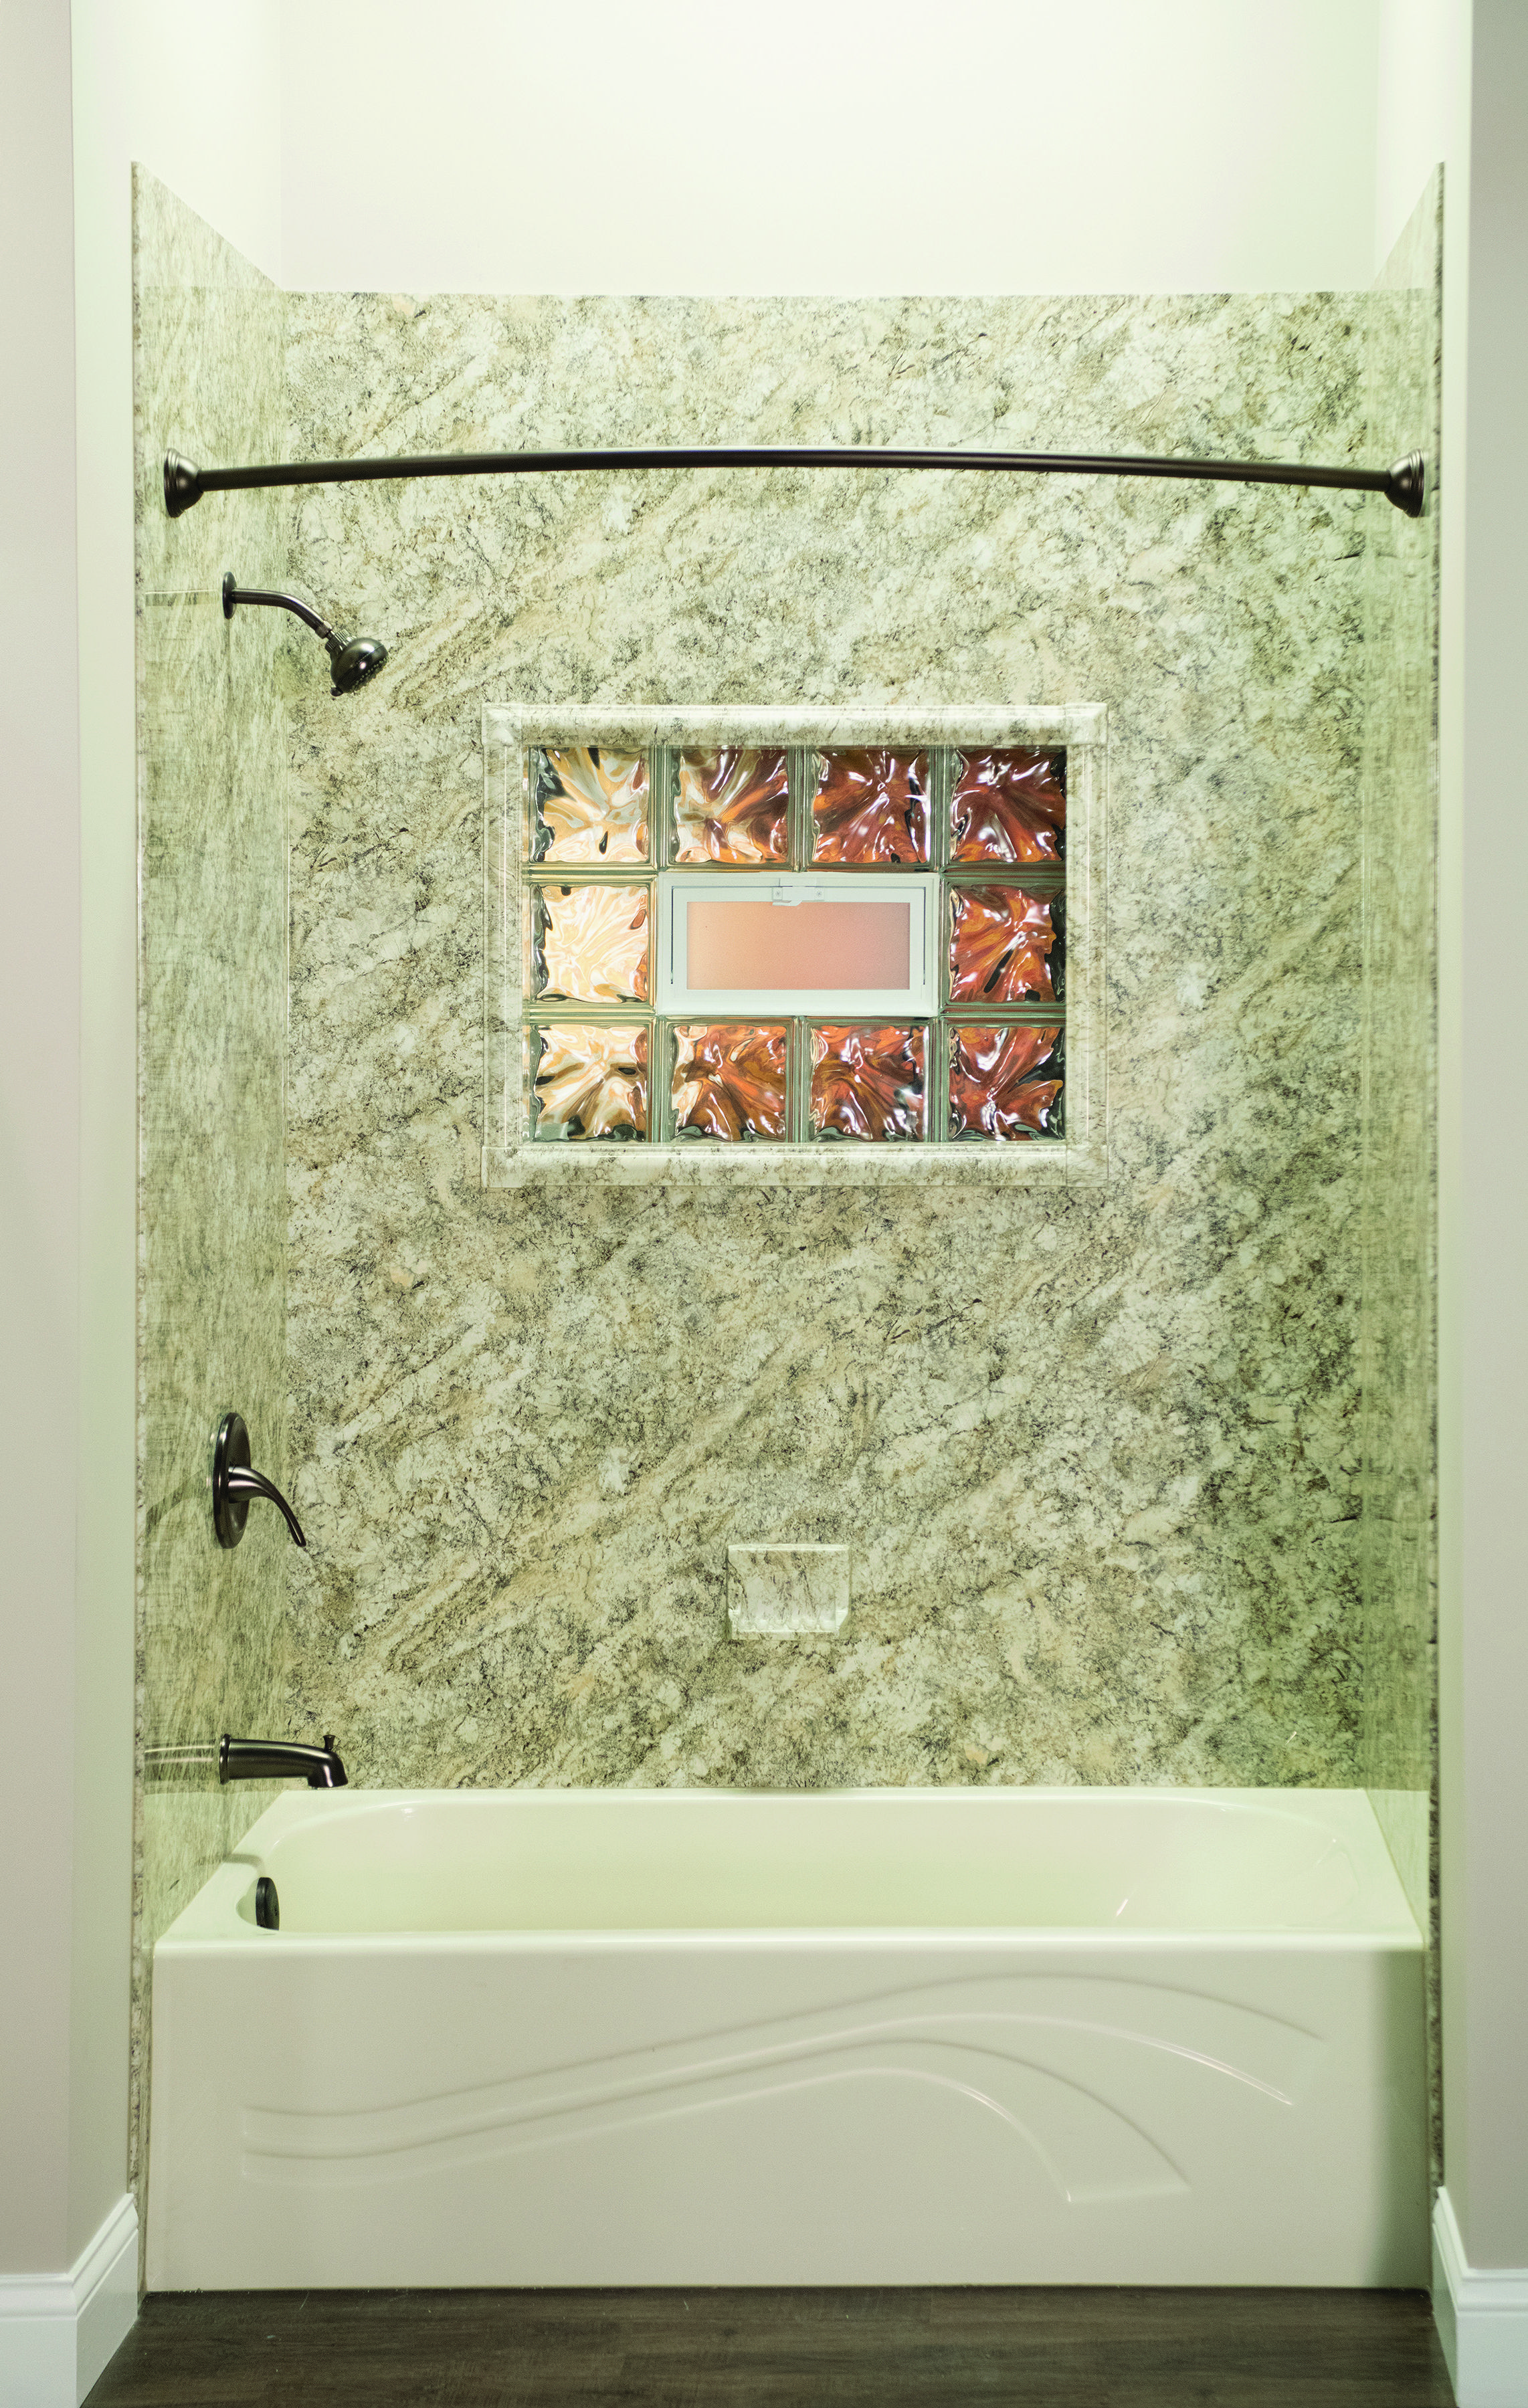 Premier Bathroom Design Platino Granite Wall Surrounds And Wave Bathtub  Luxury Bath